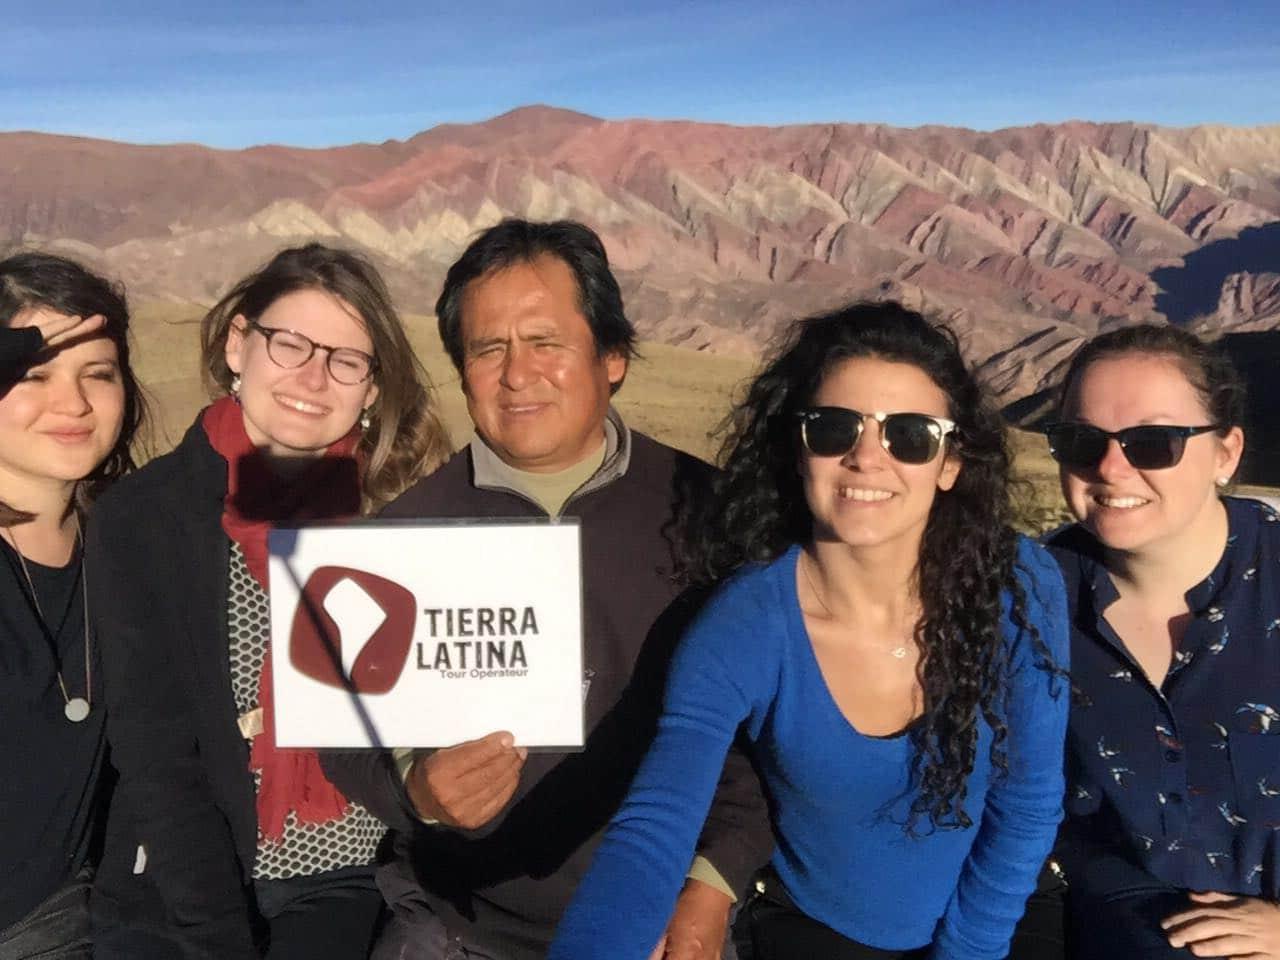 Argentine Salta guide voyage sur mesure tierra latina